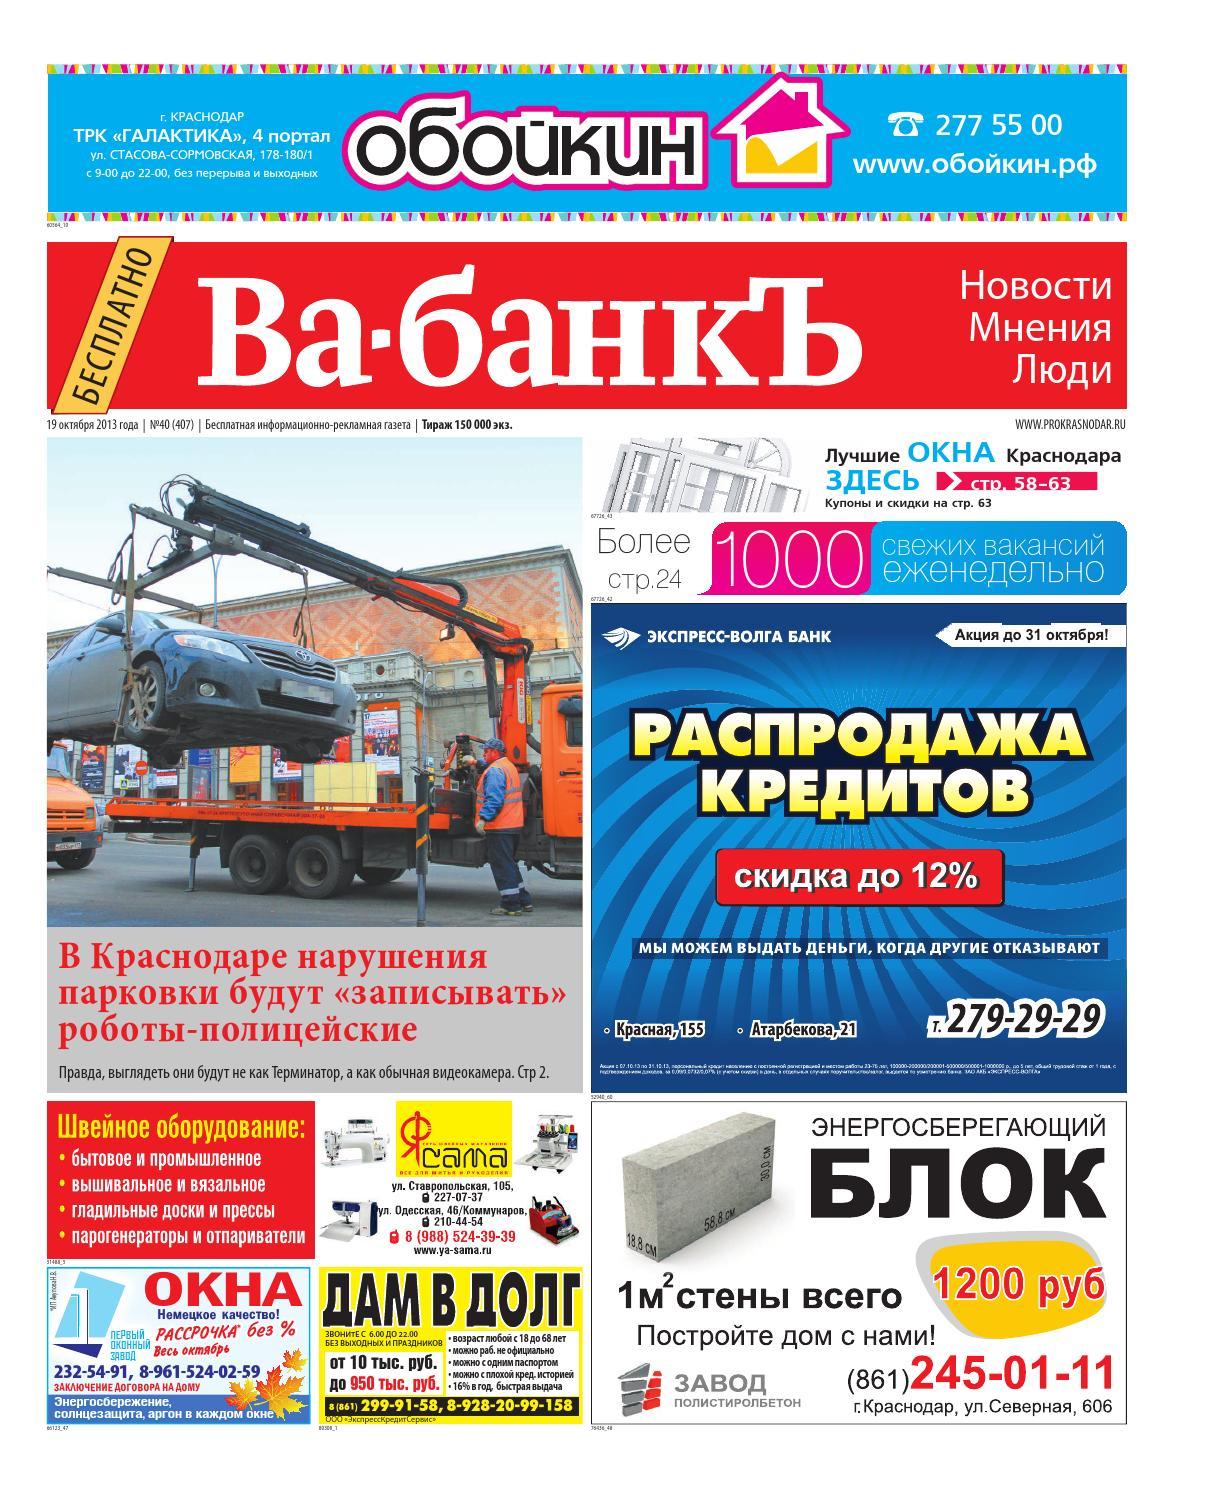 pro100banki ru займ без отказакак оформить кредит на карту сбербанка моментум